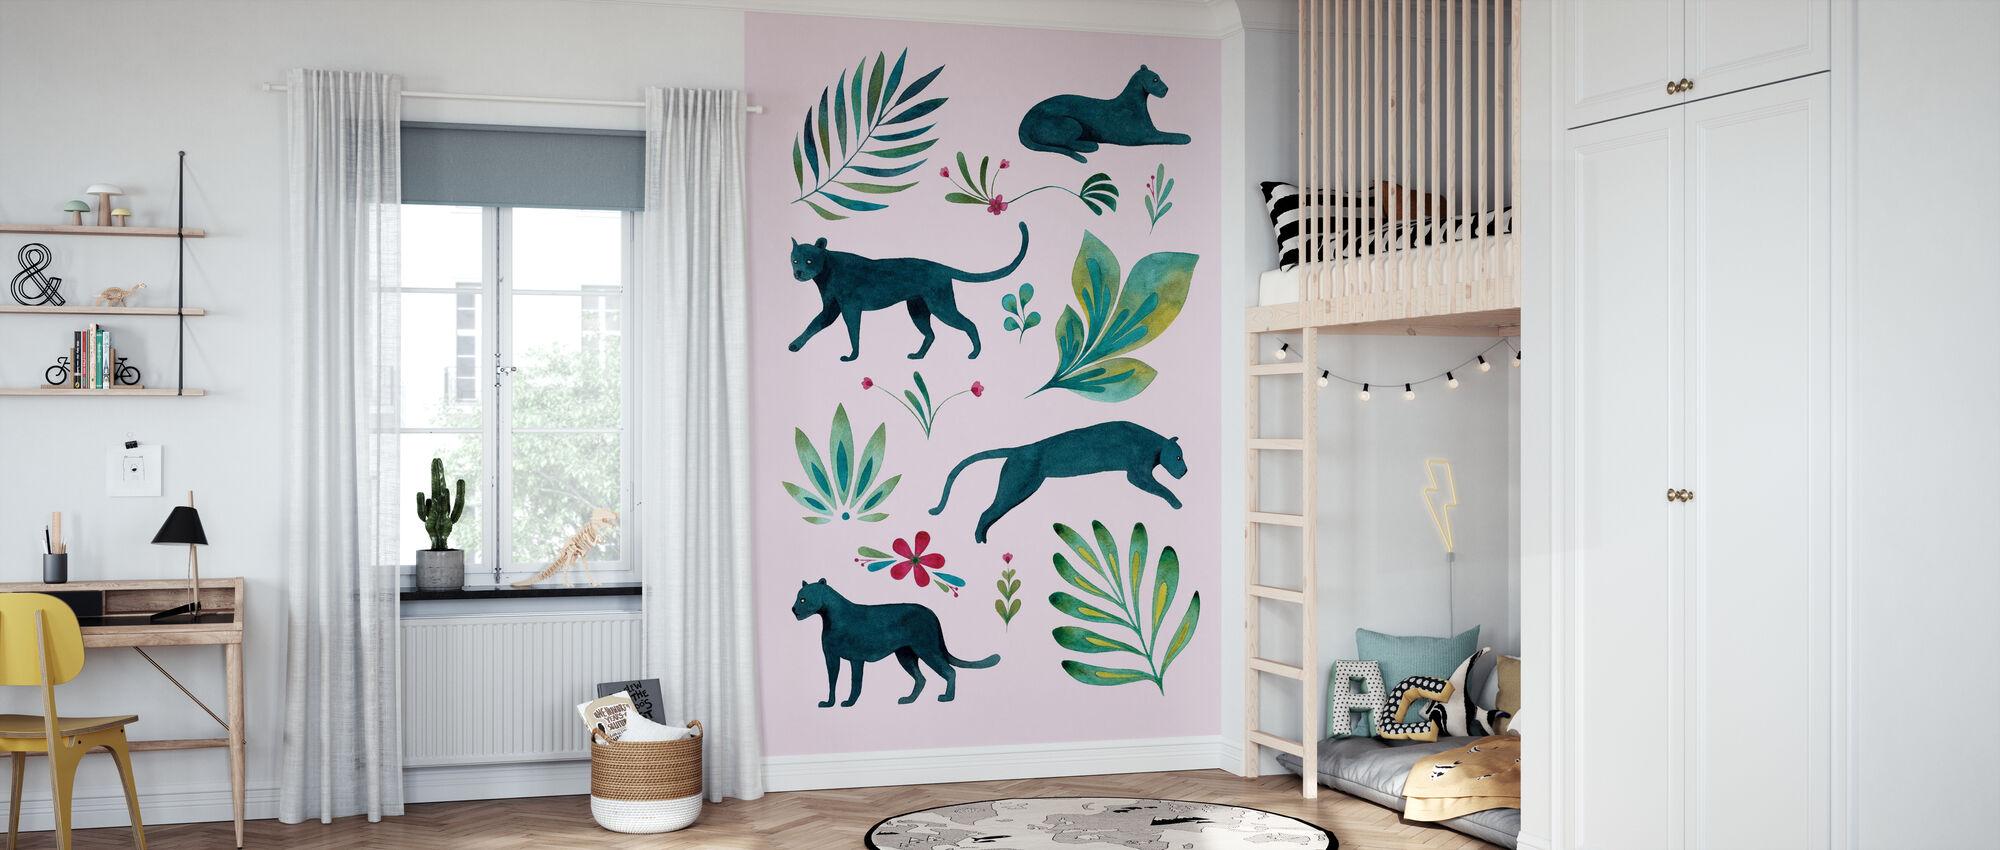 Panther - Wallpaper - Kids Room